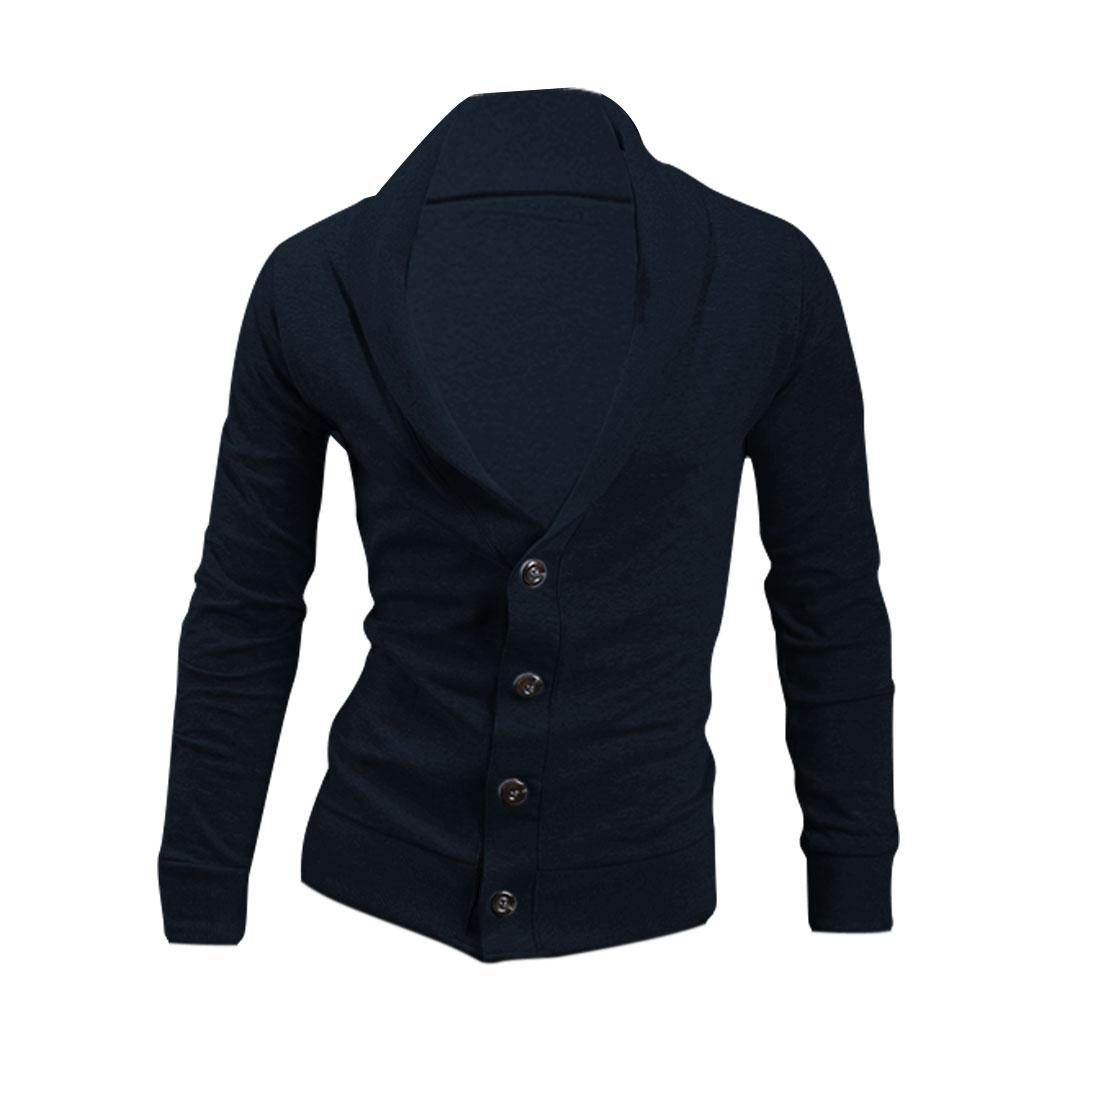 Men Button Closure Stretchy Autumn Cardigan Navy Blue L